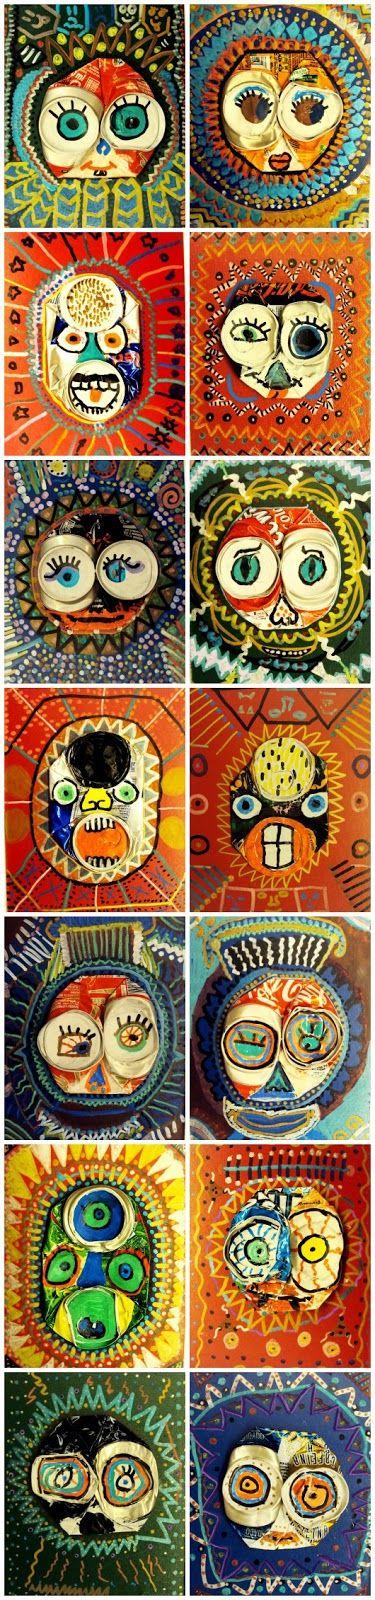 Plastiquem: artista Didier Triglia soda can art